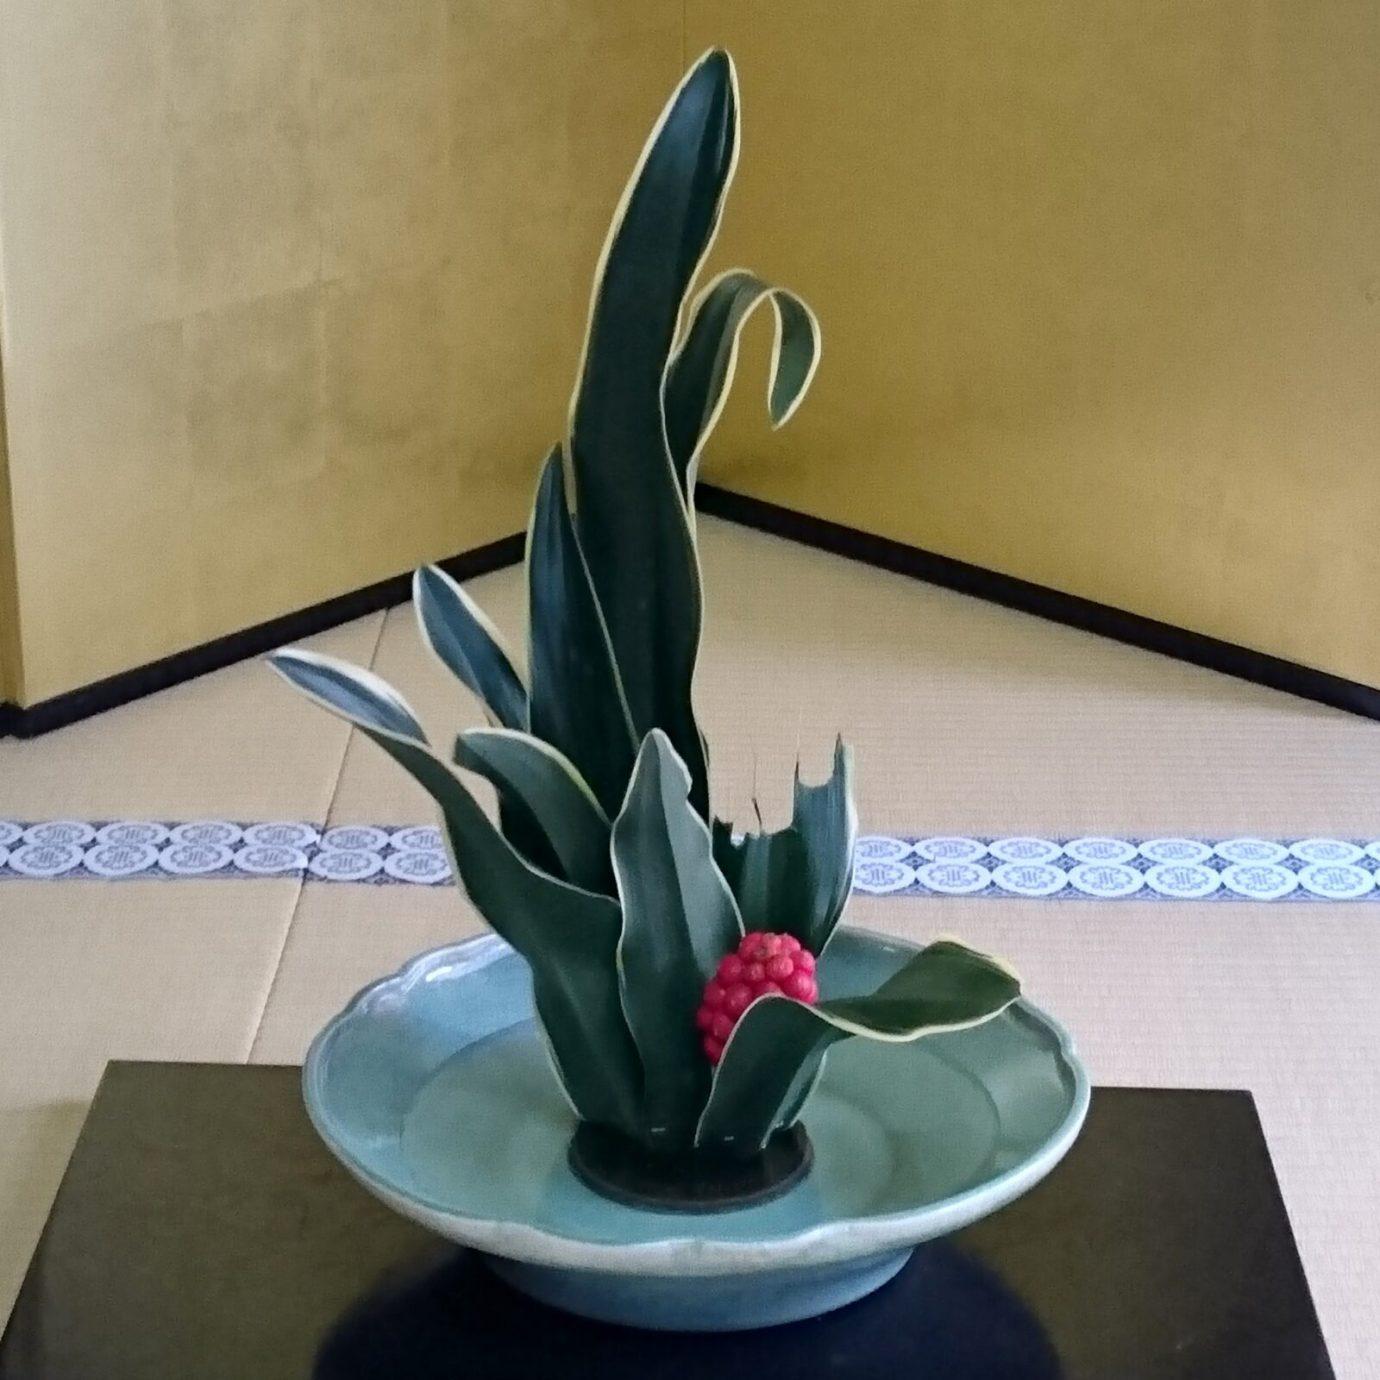 Detail of Ikebana